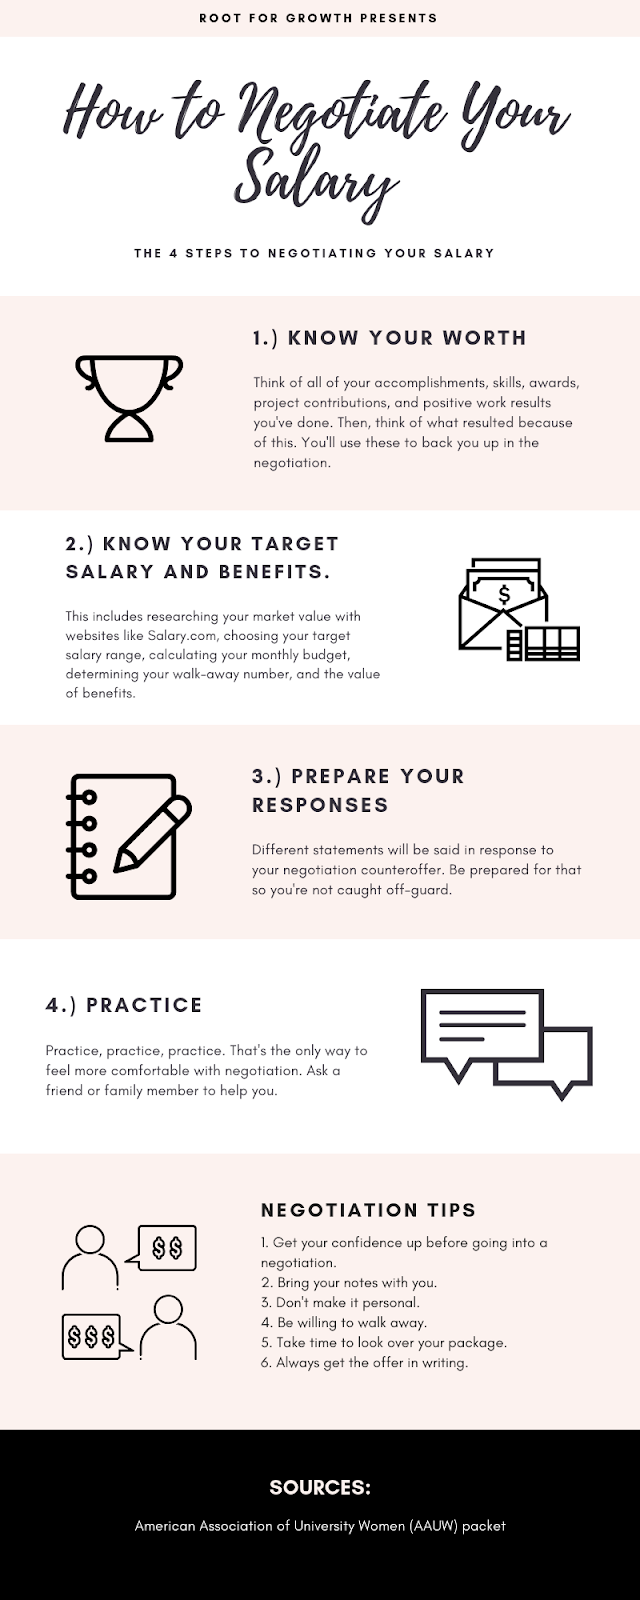 Learn how to do salary negotiation tips new job and negotiation tactics